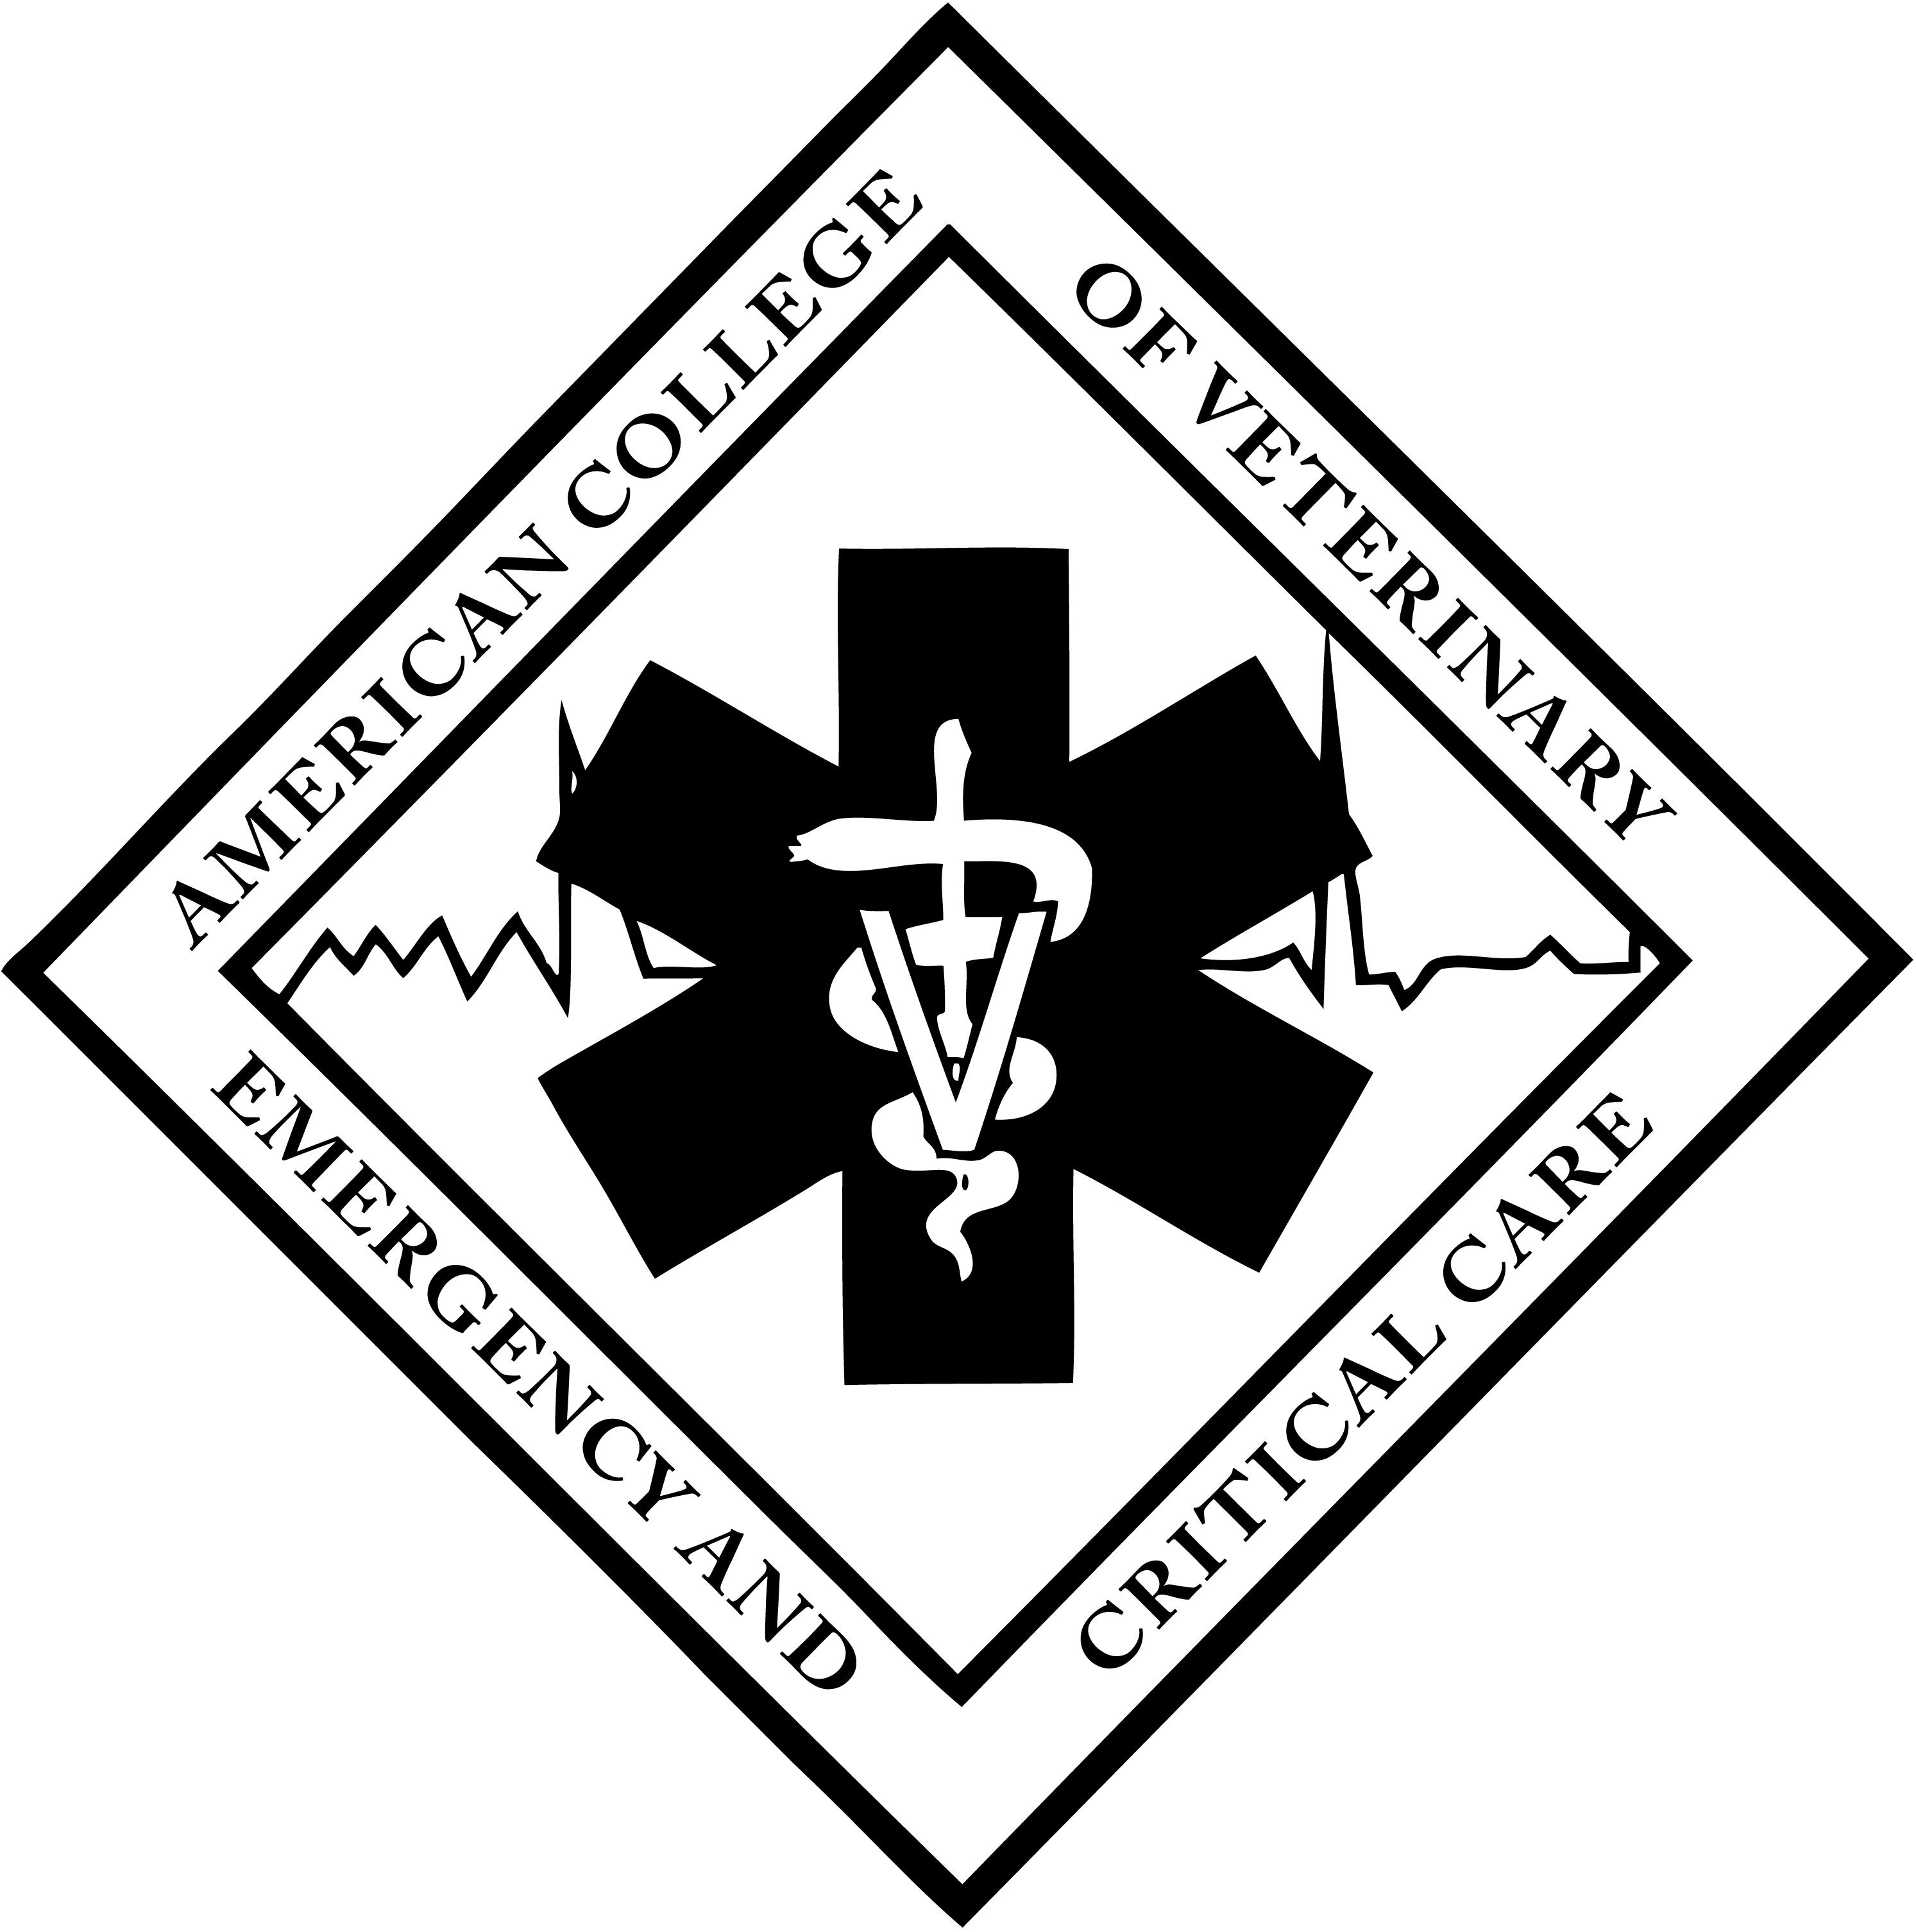 Image=ACVECC logo